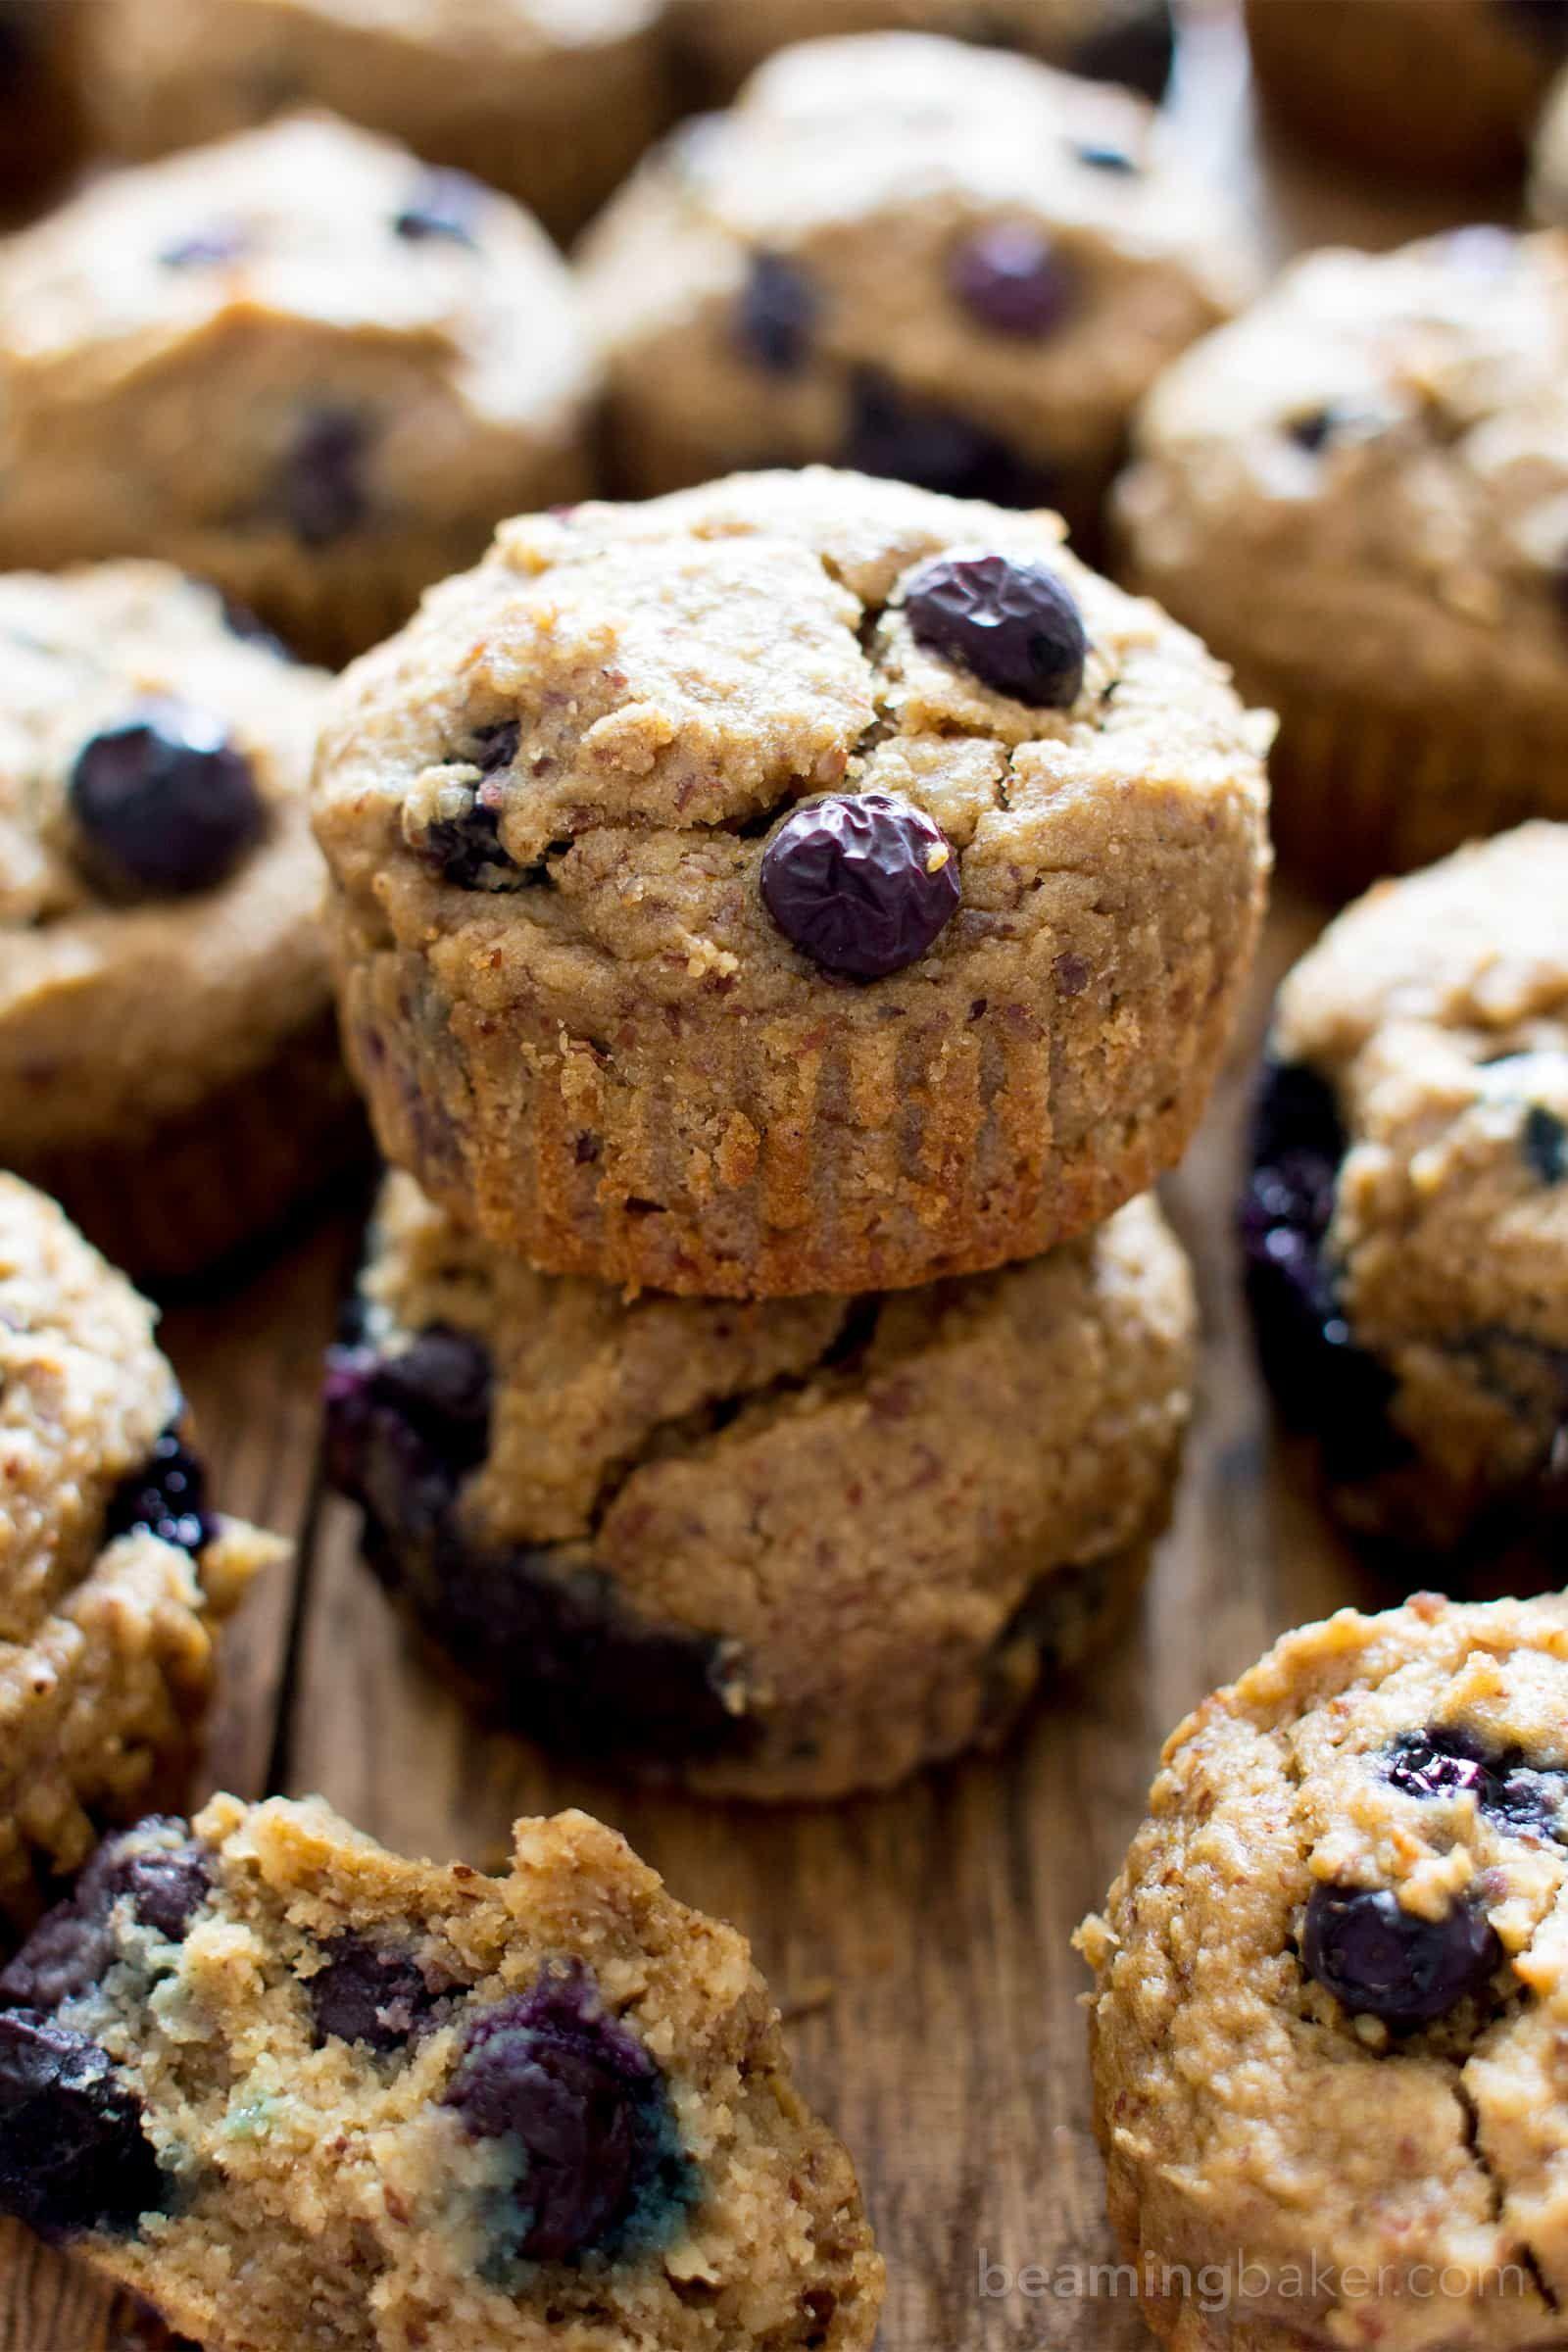 Gluten Free Vegan Blueberry Applesauce Muffins V Gf A One Bowl